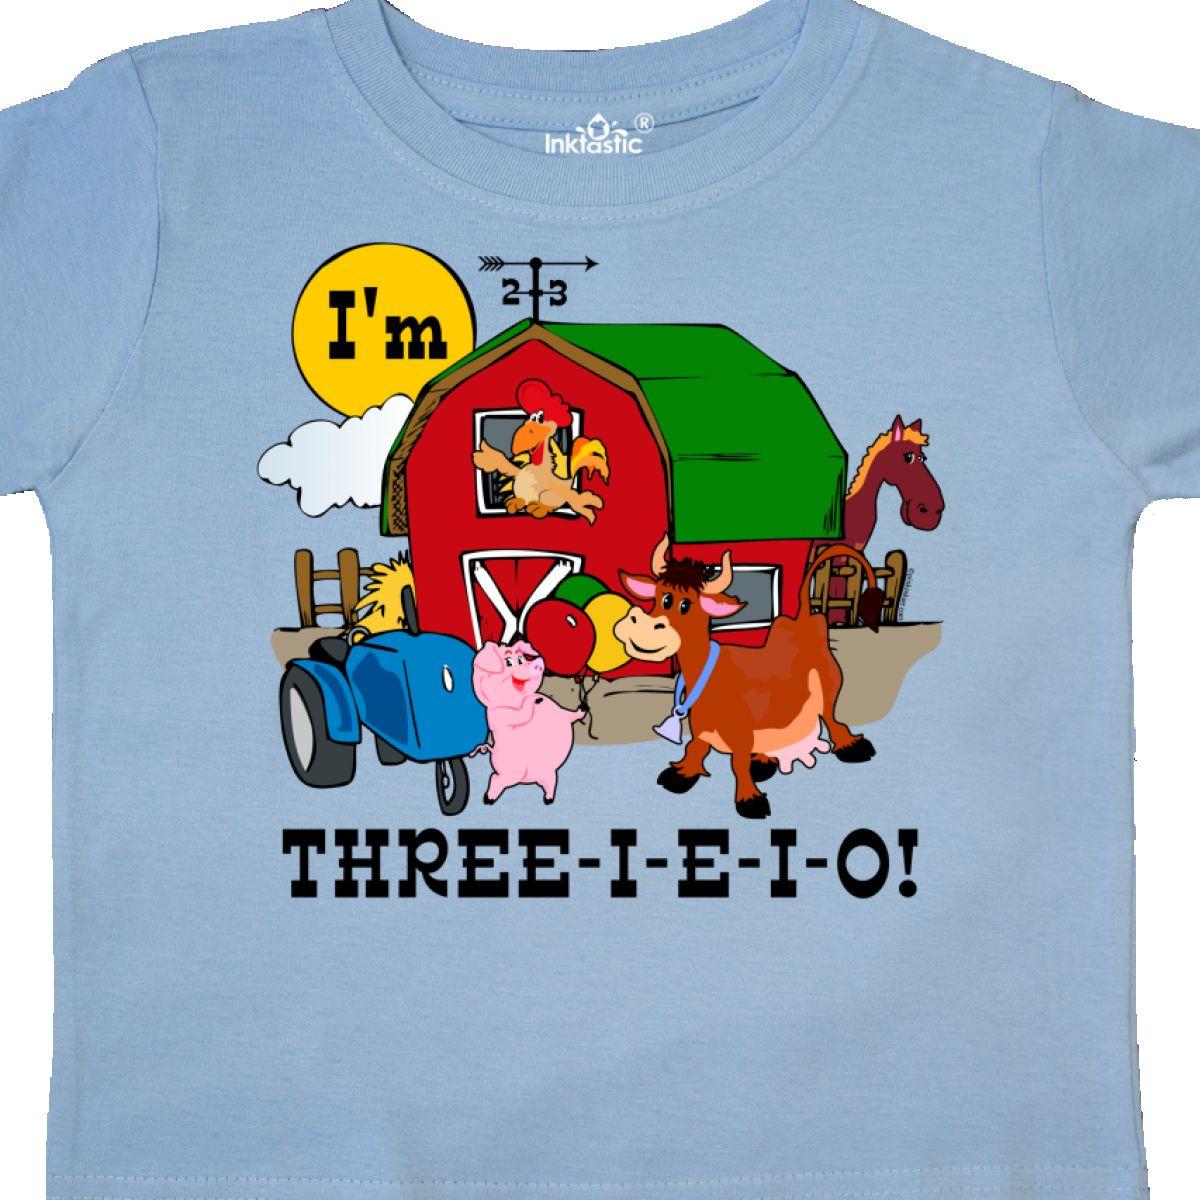 Inktastic THREE-I-E-I-O Toddler T-Shirt Barn Cow Pig Horse Eieio Tractor Cute